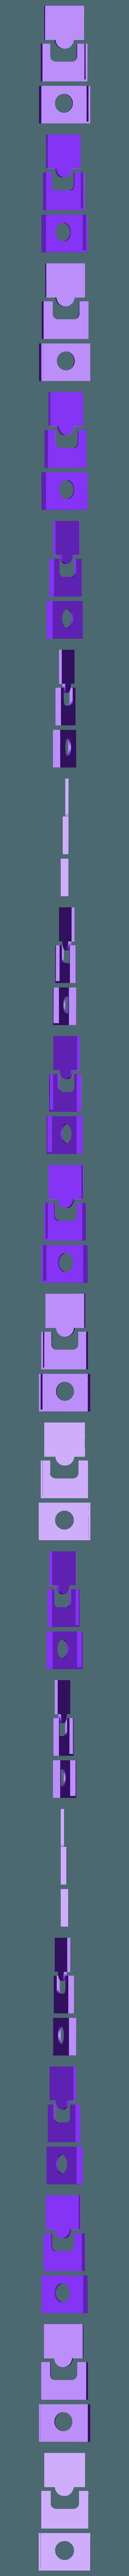 CF_Card_Sleeve_jig.stl Download free STL file Lasercut EVA foam CF Card sleeve + gluing jig • 3D printing template, dancingchicken